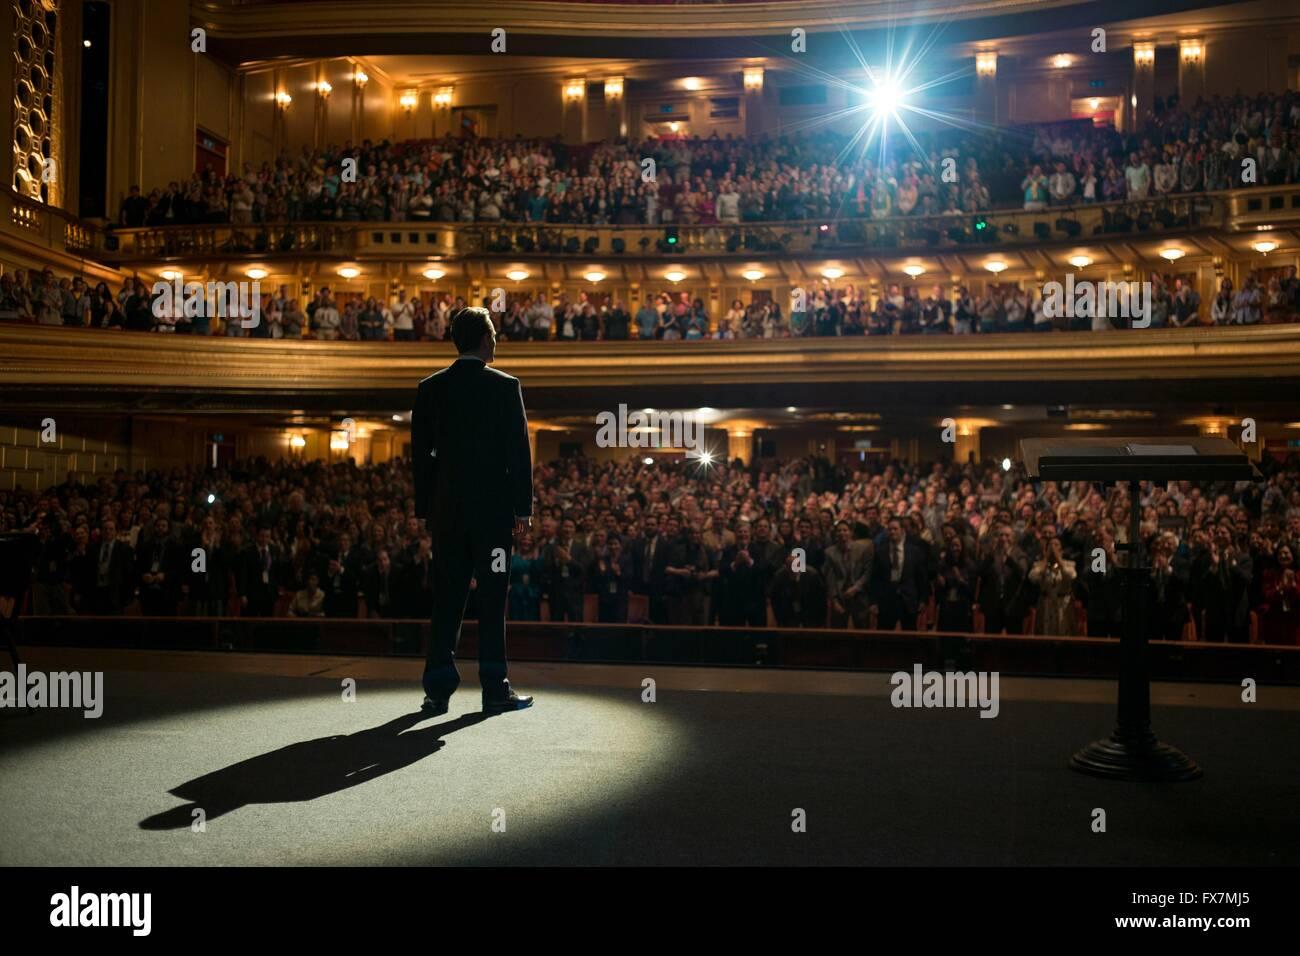 Steve Jobs Year : 2016 USA / UK Director : Danny Boyle Michael Fassbender - Stock Image